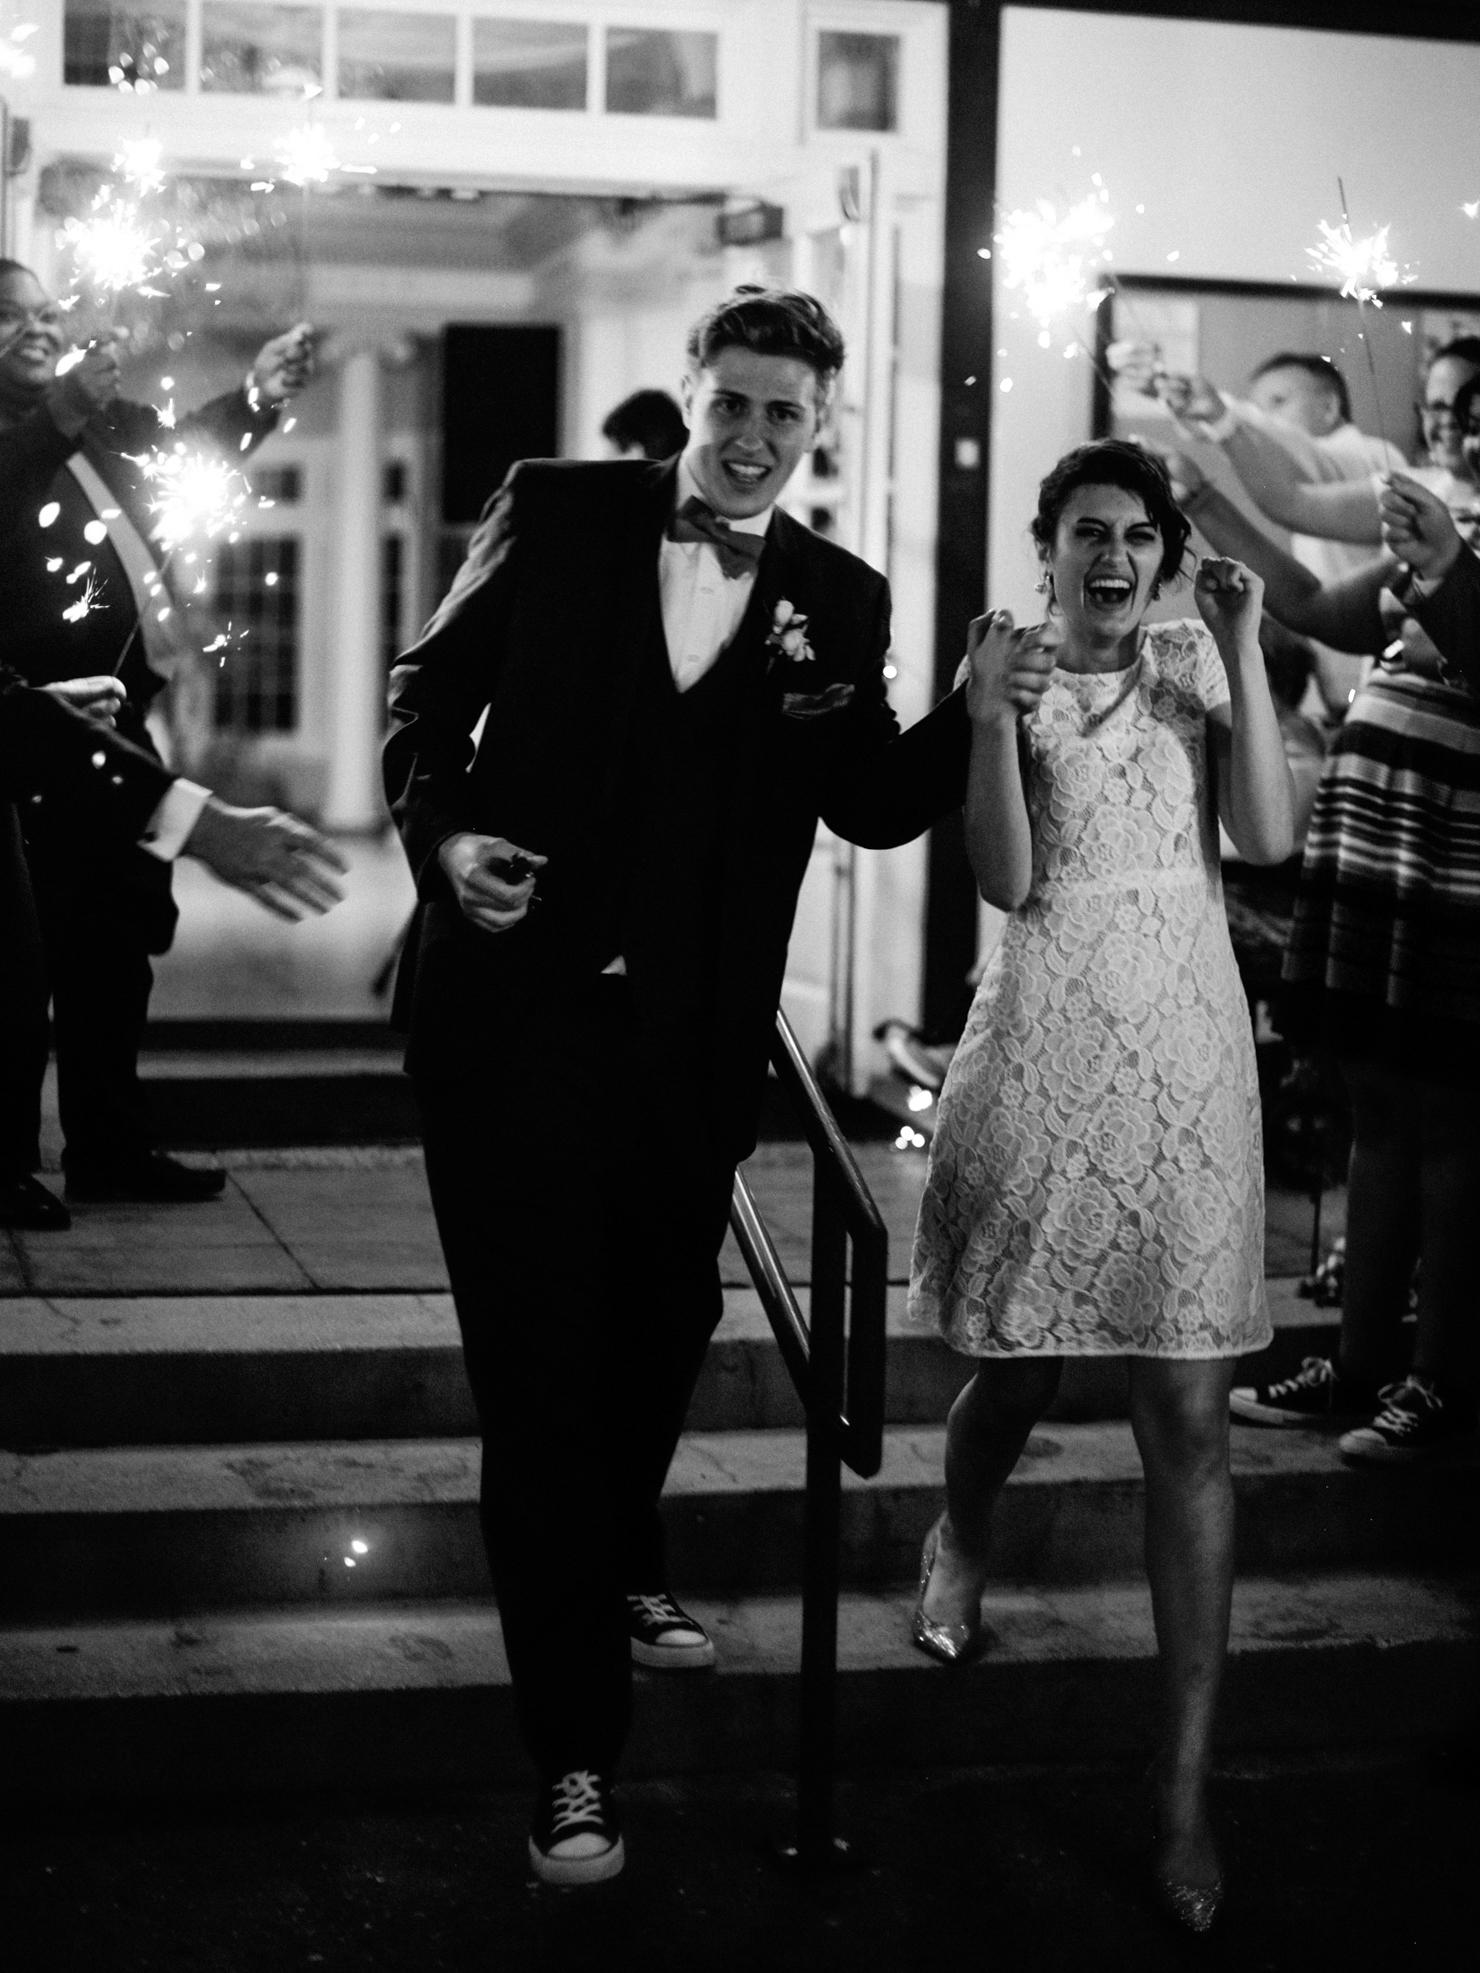 saratoga-springs-national-dance-eclectic-downtown-charlotte-film-wedding-photographer-carousel-39.jpg